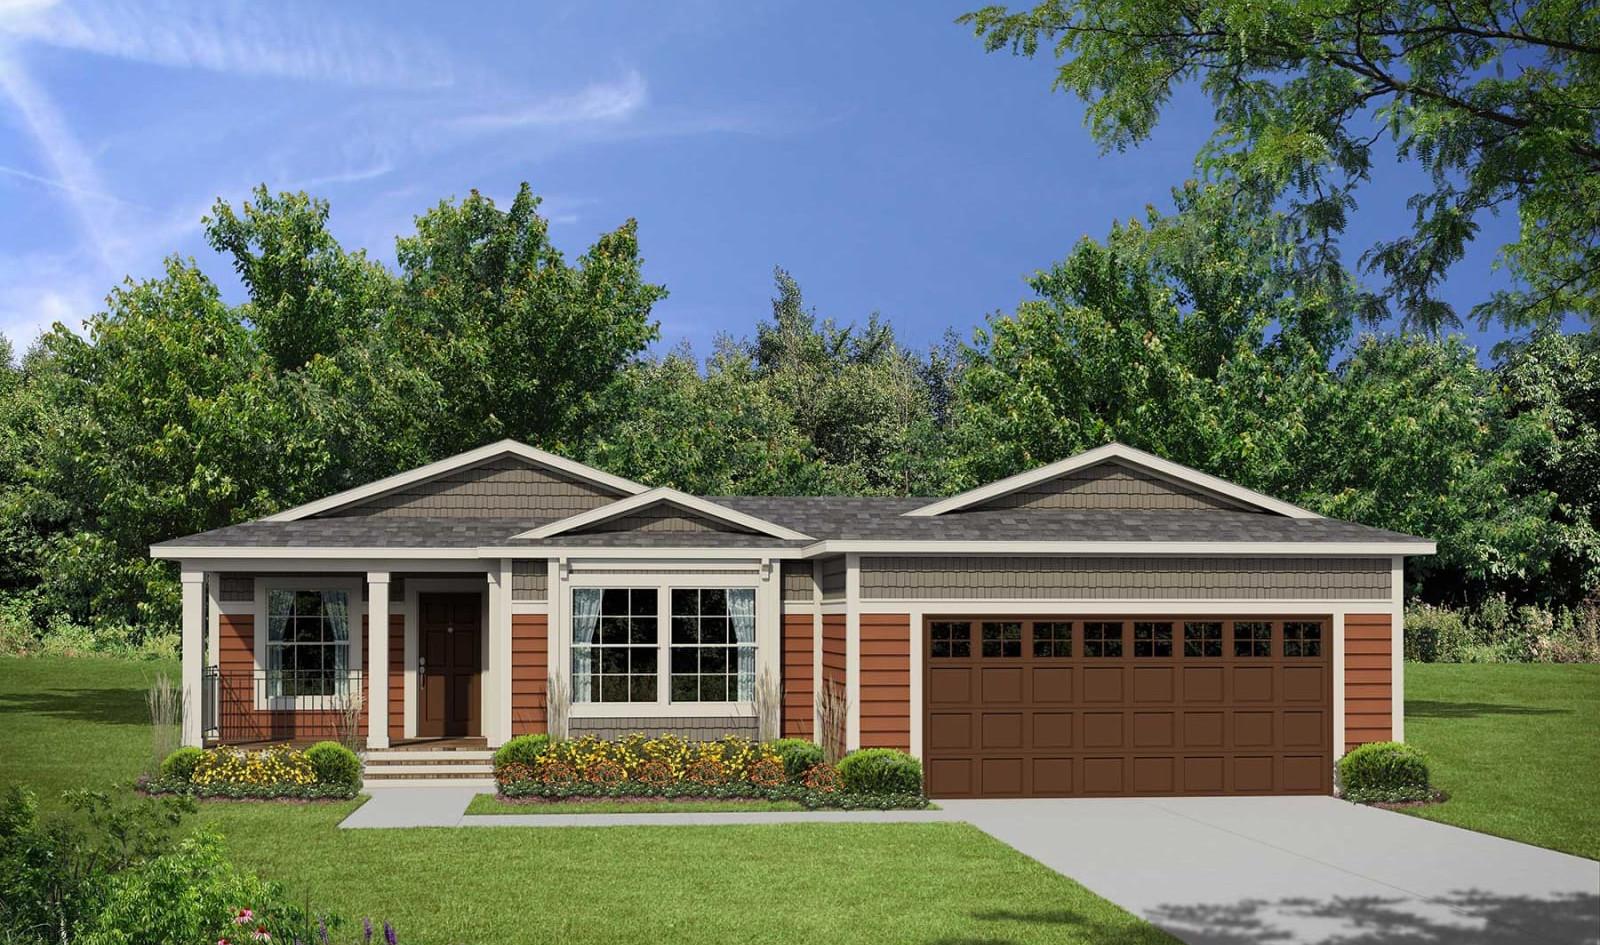 claysburg-catena-with-garage